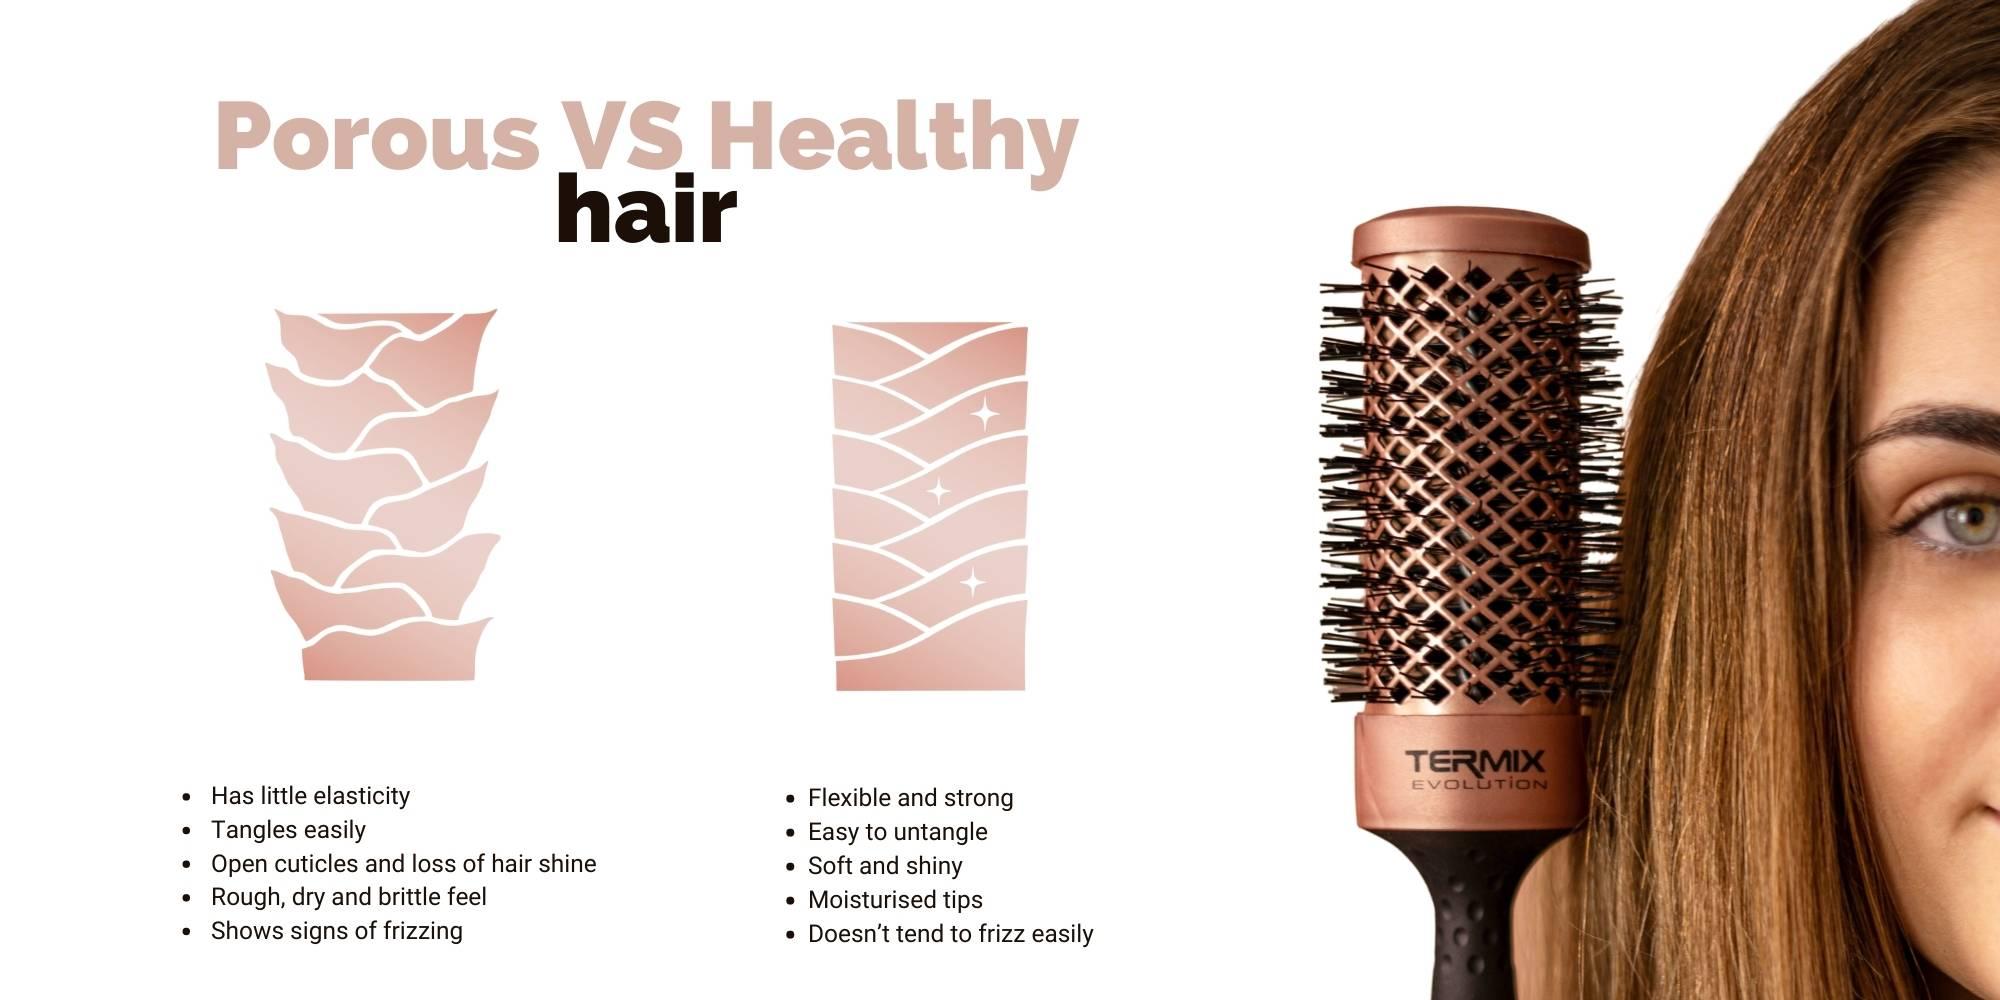 Porous vs healthy hair